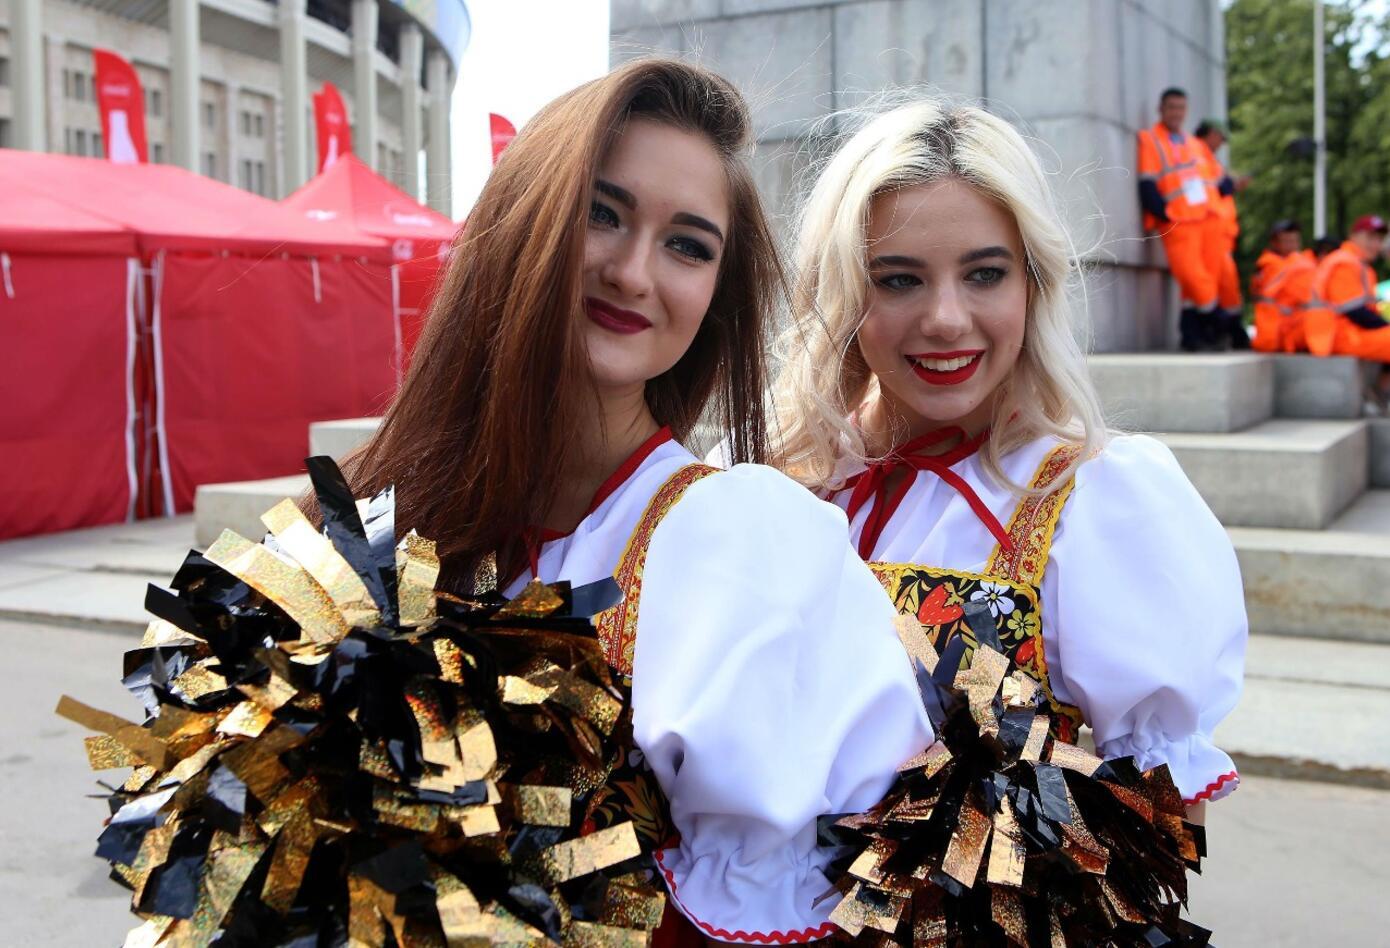 Fanáticas Rusas apoyan a su selección en estadio Luzhniki de Moscú